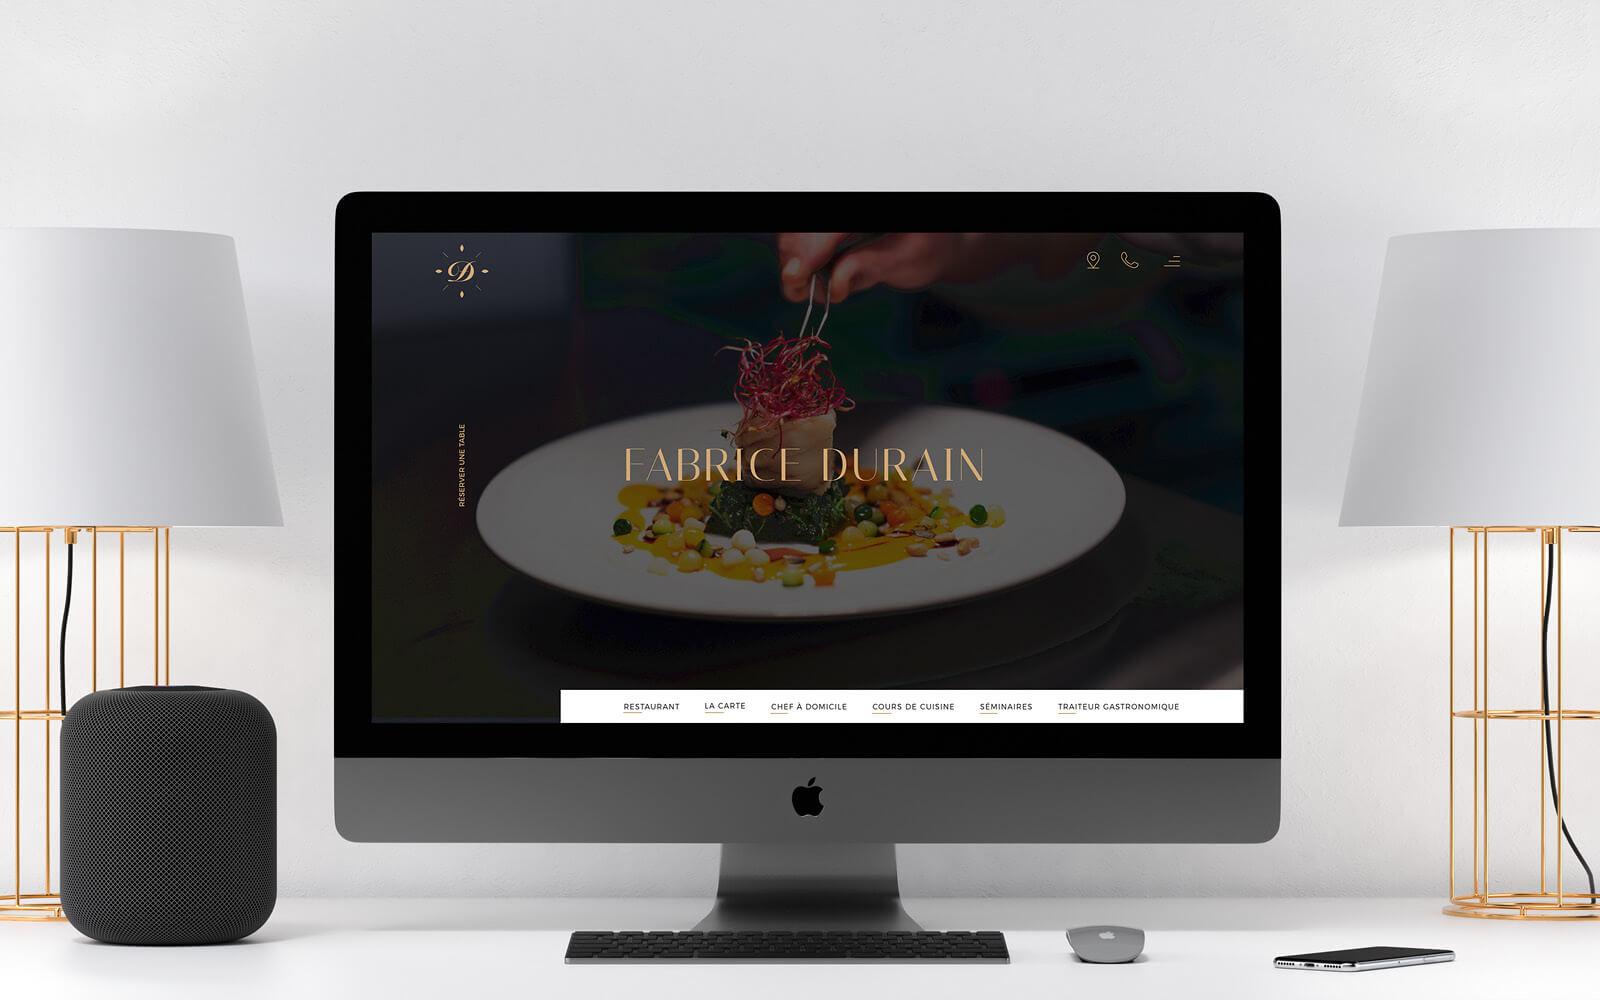 lezardscreation agence communication publicite vosges remiremont durain lezards creationfabrice durain site restaurant